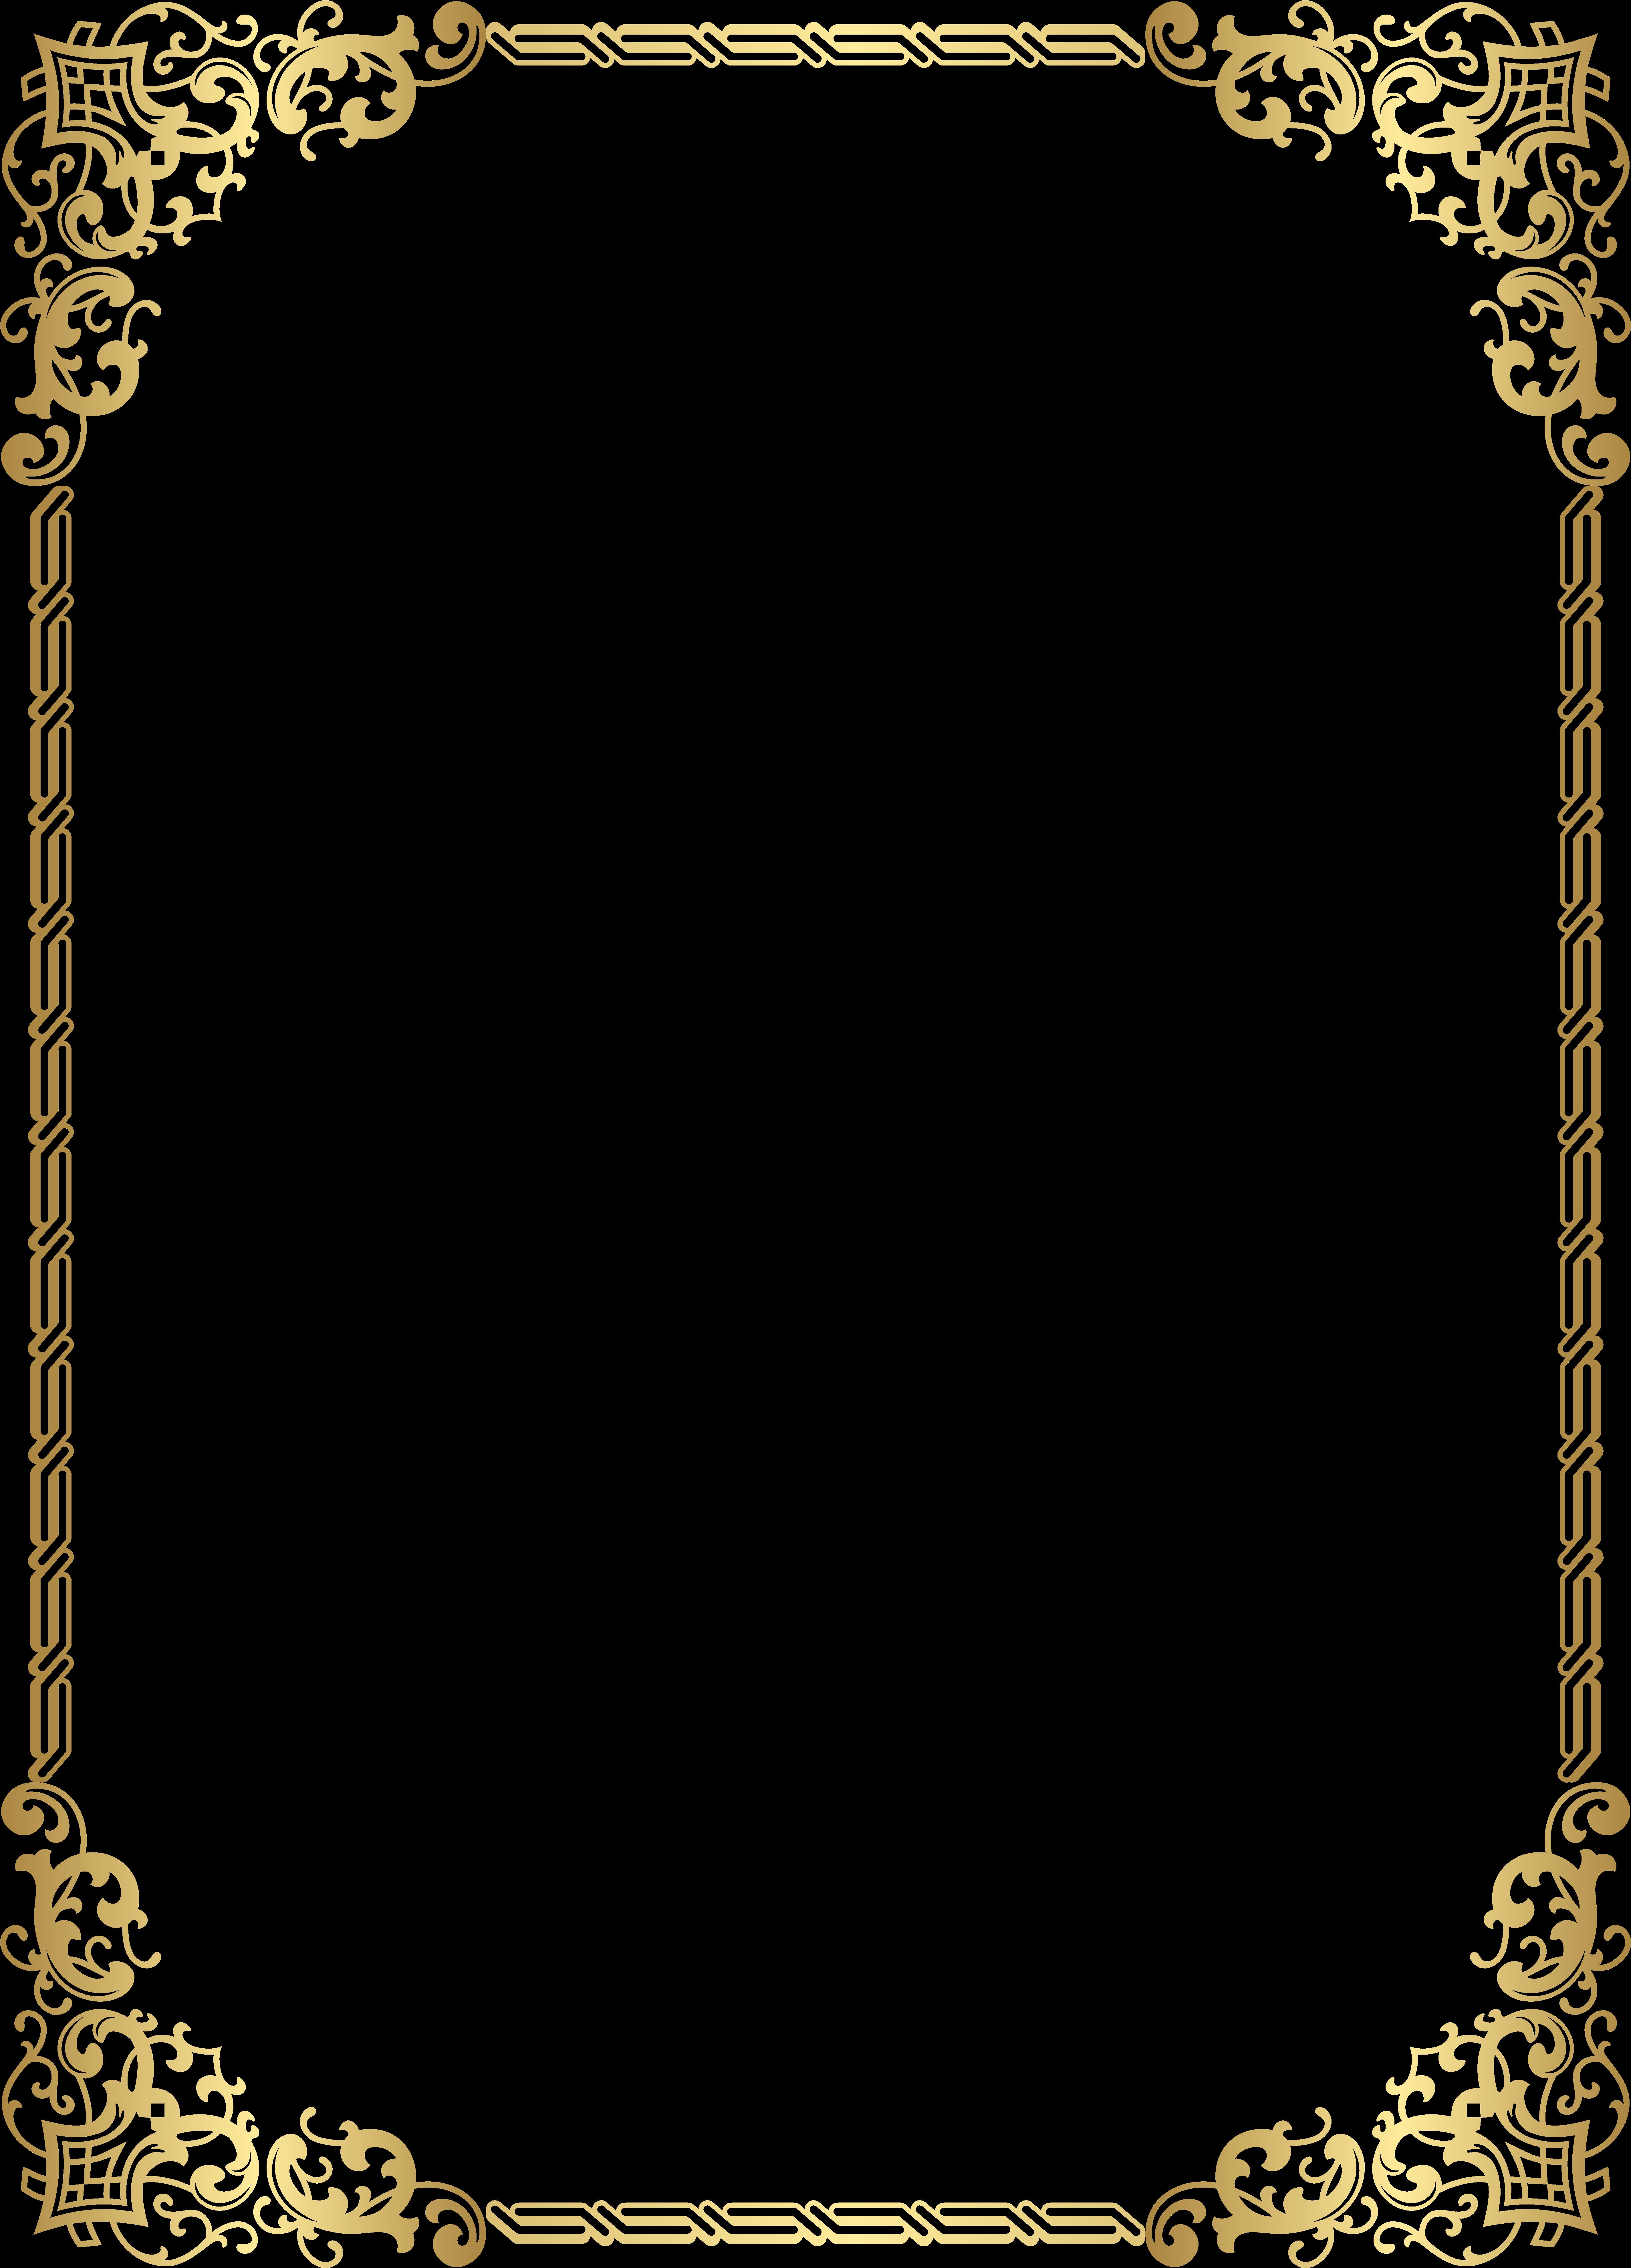 Gold Border Frame Transparent Clip Art Image - Gold Border Clip Art (5753x8000)